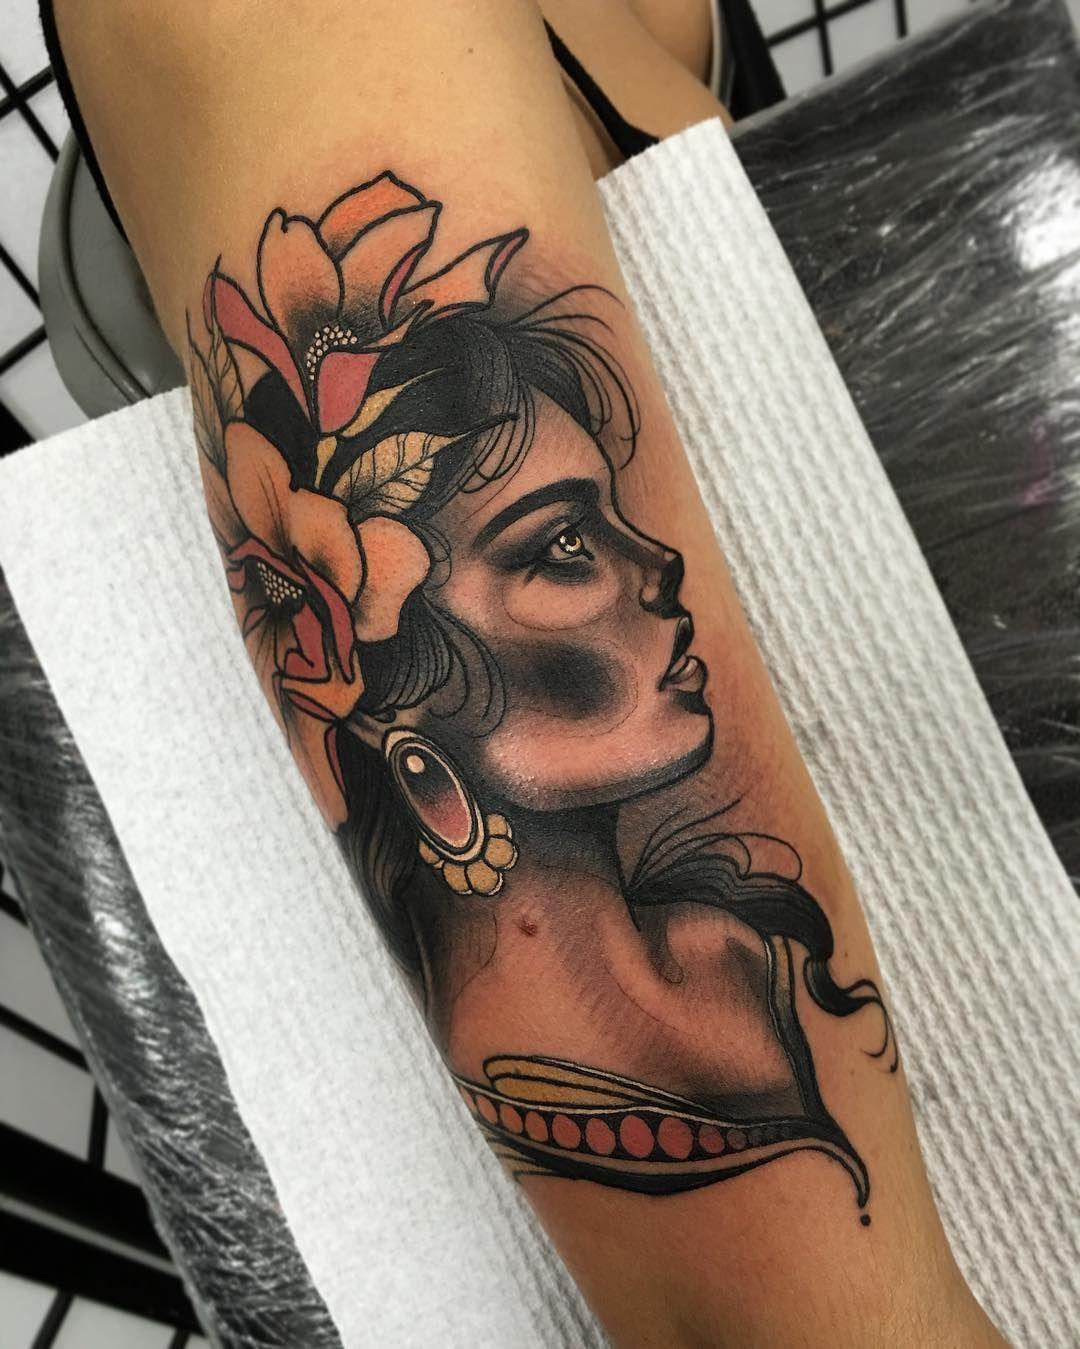 Tattoo @timtavariaTattoo #neo #traditional #realism